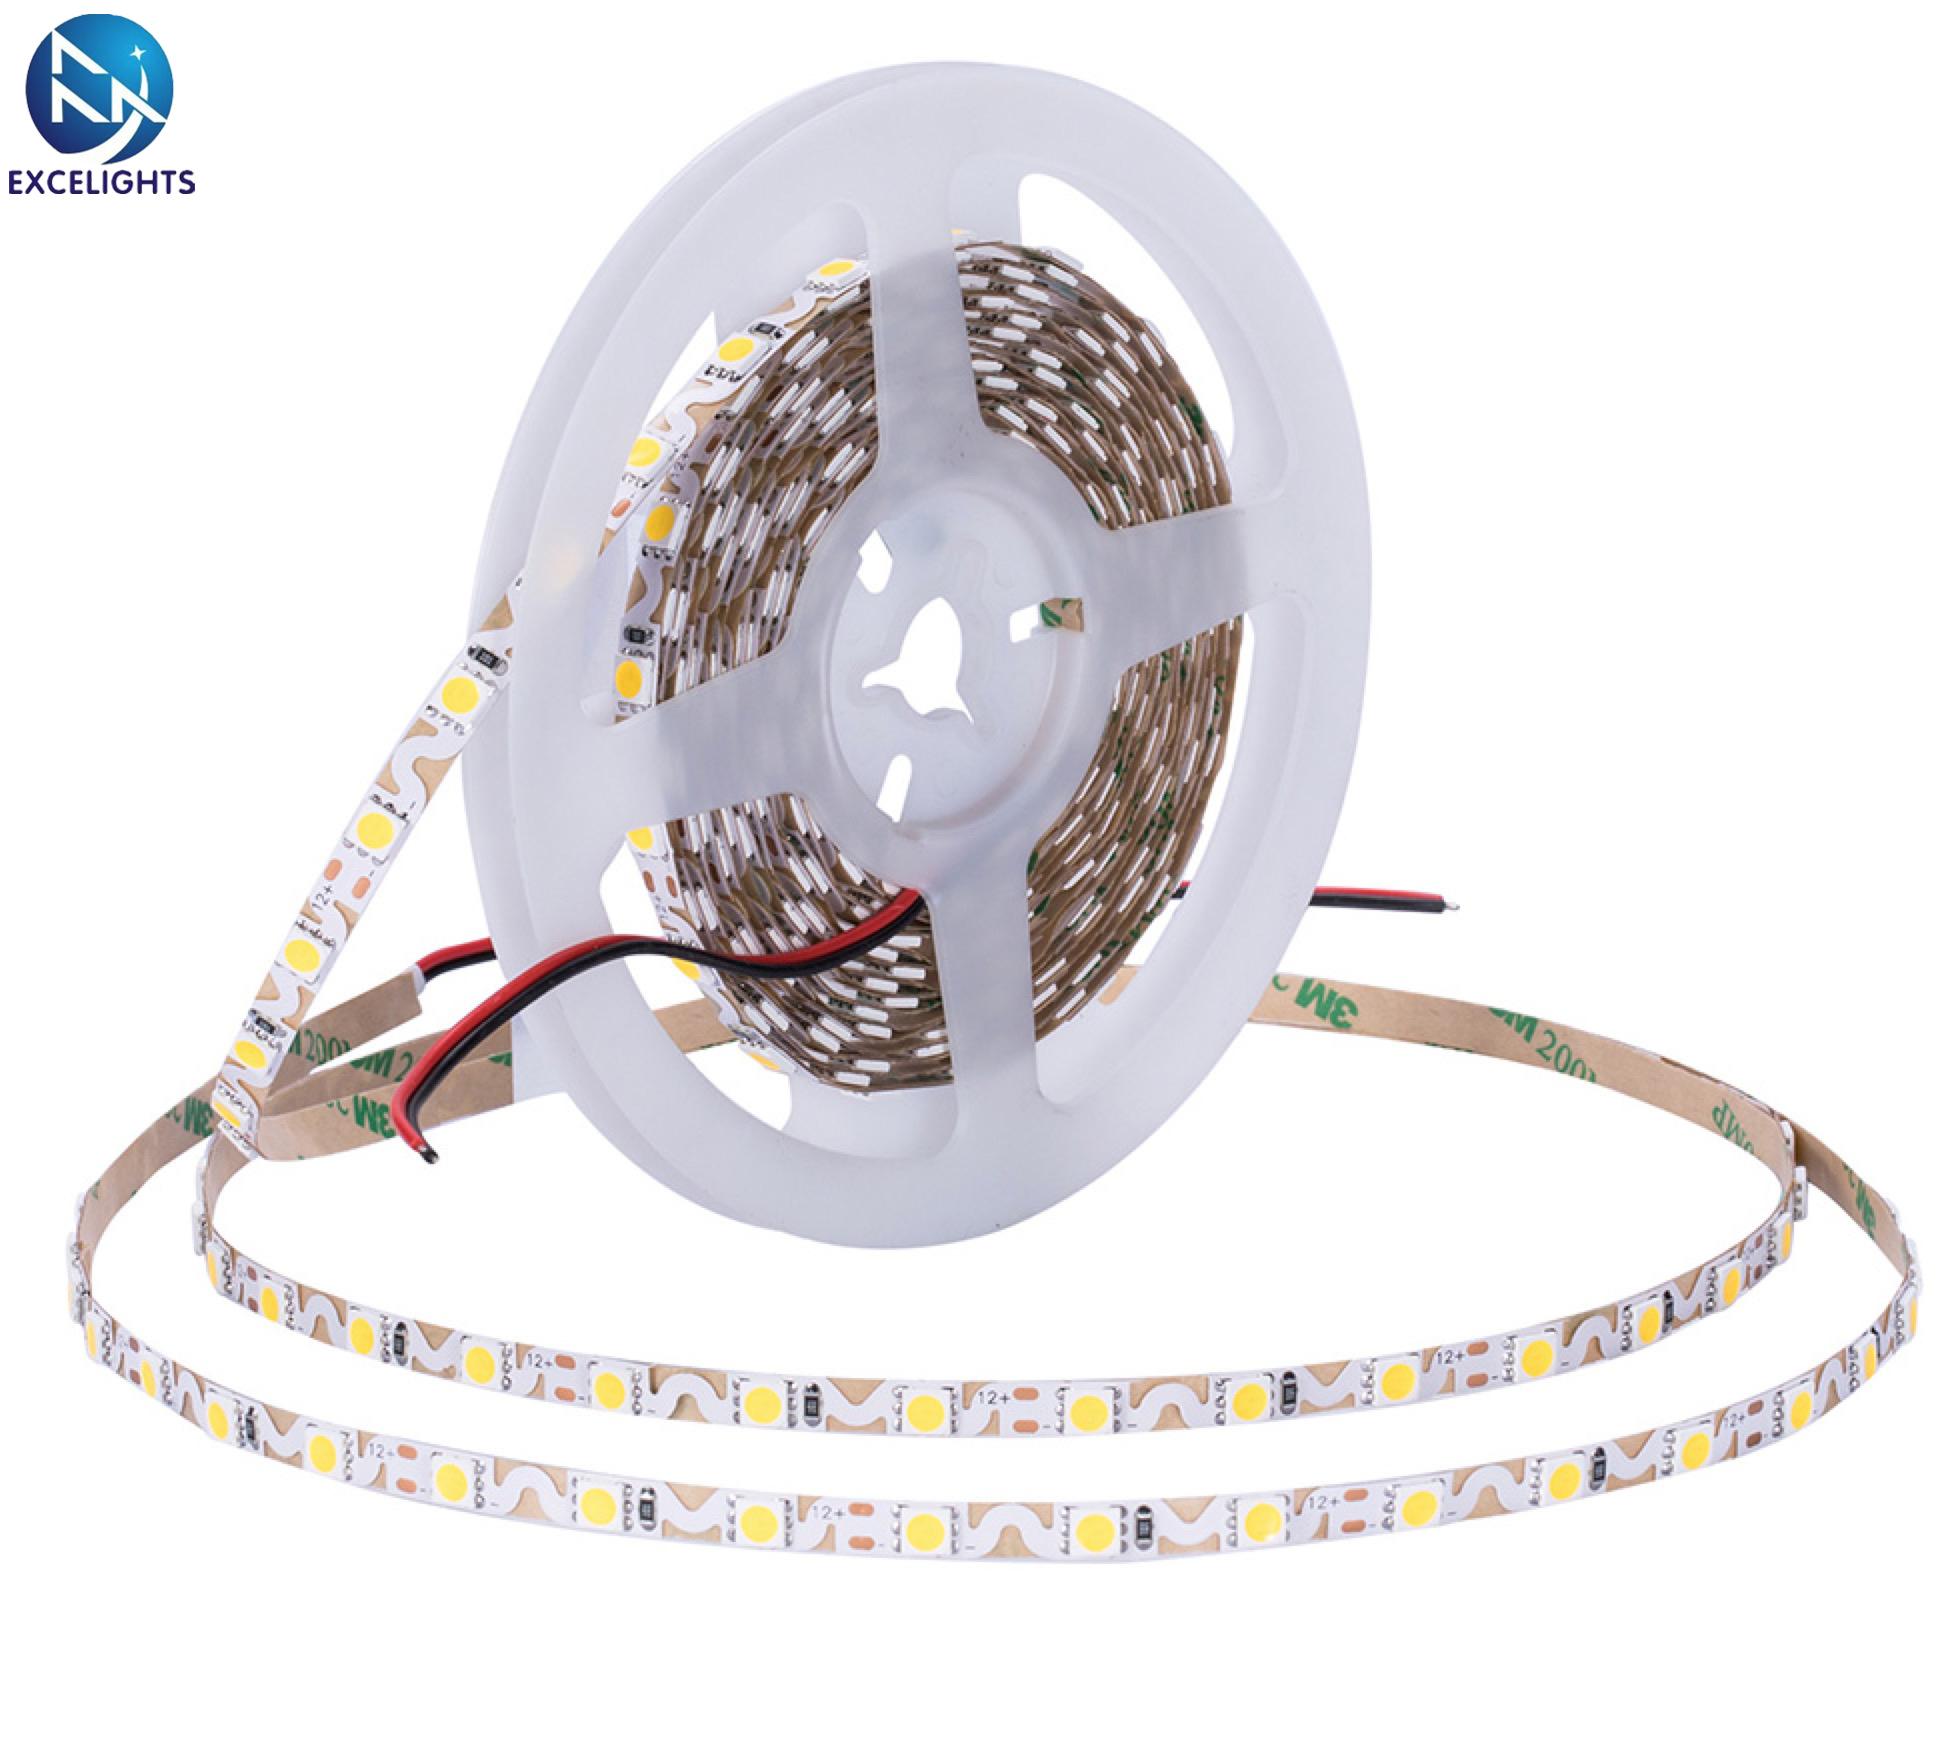 10m/rollo Ultra estrecho señalizaciones canal carta SMD Flexible cinta 12V DC 2835 S en forma de Zigzag LED de luz de tira